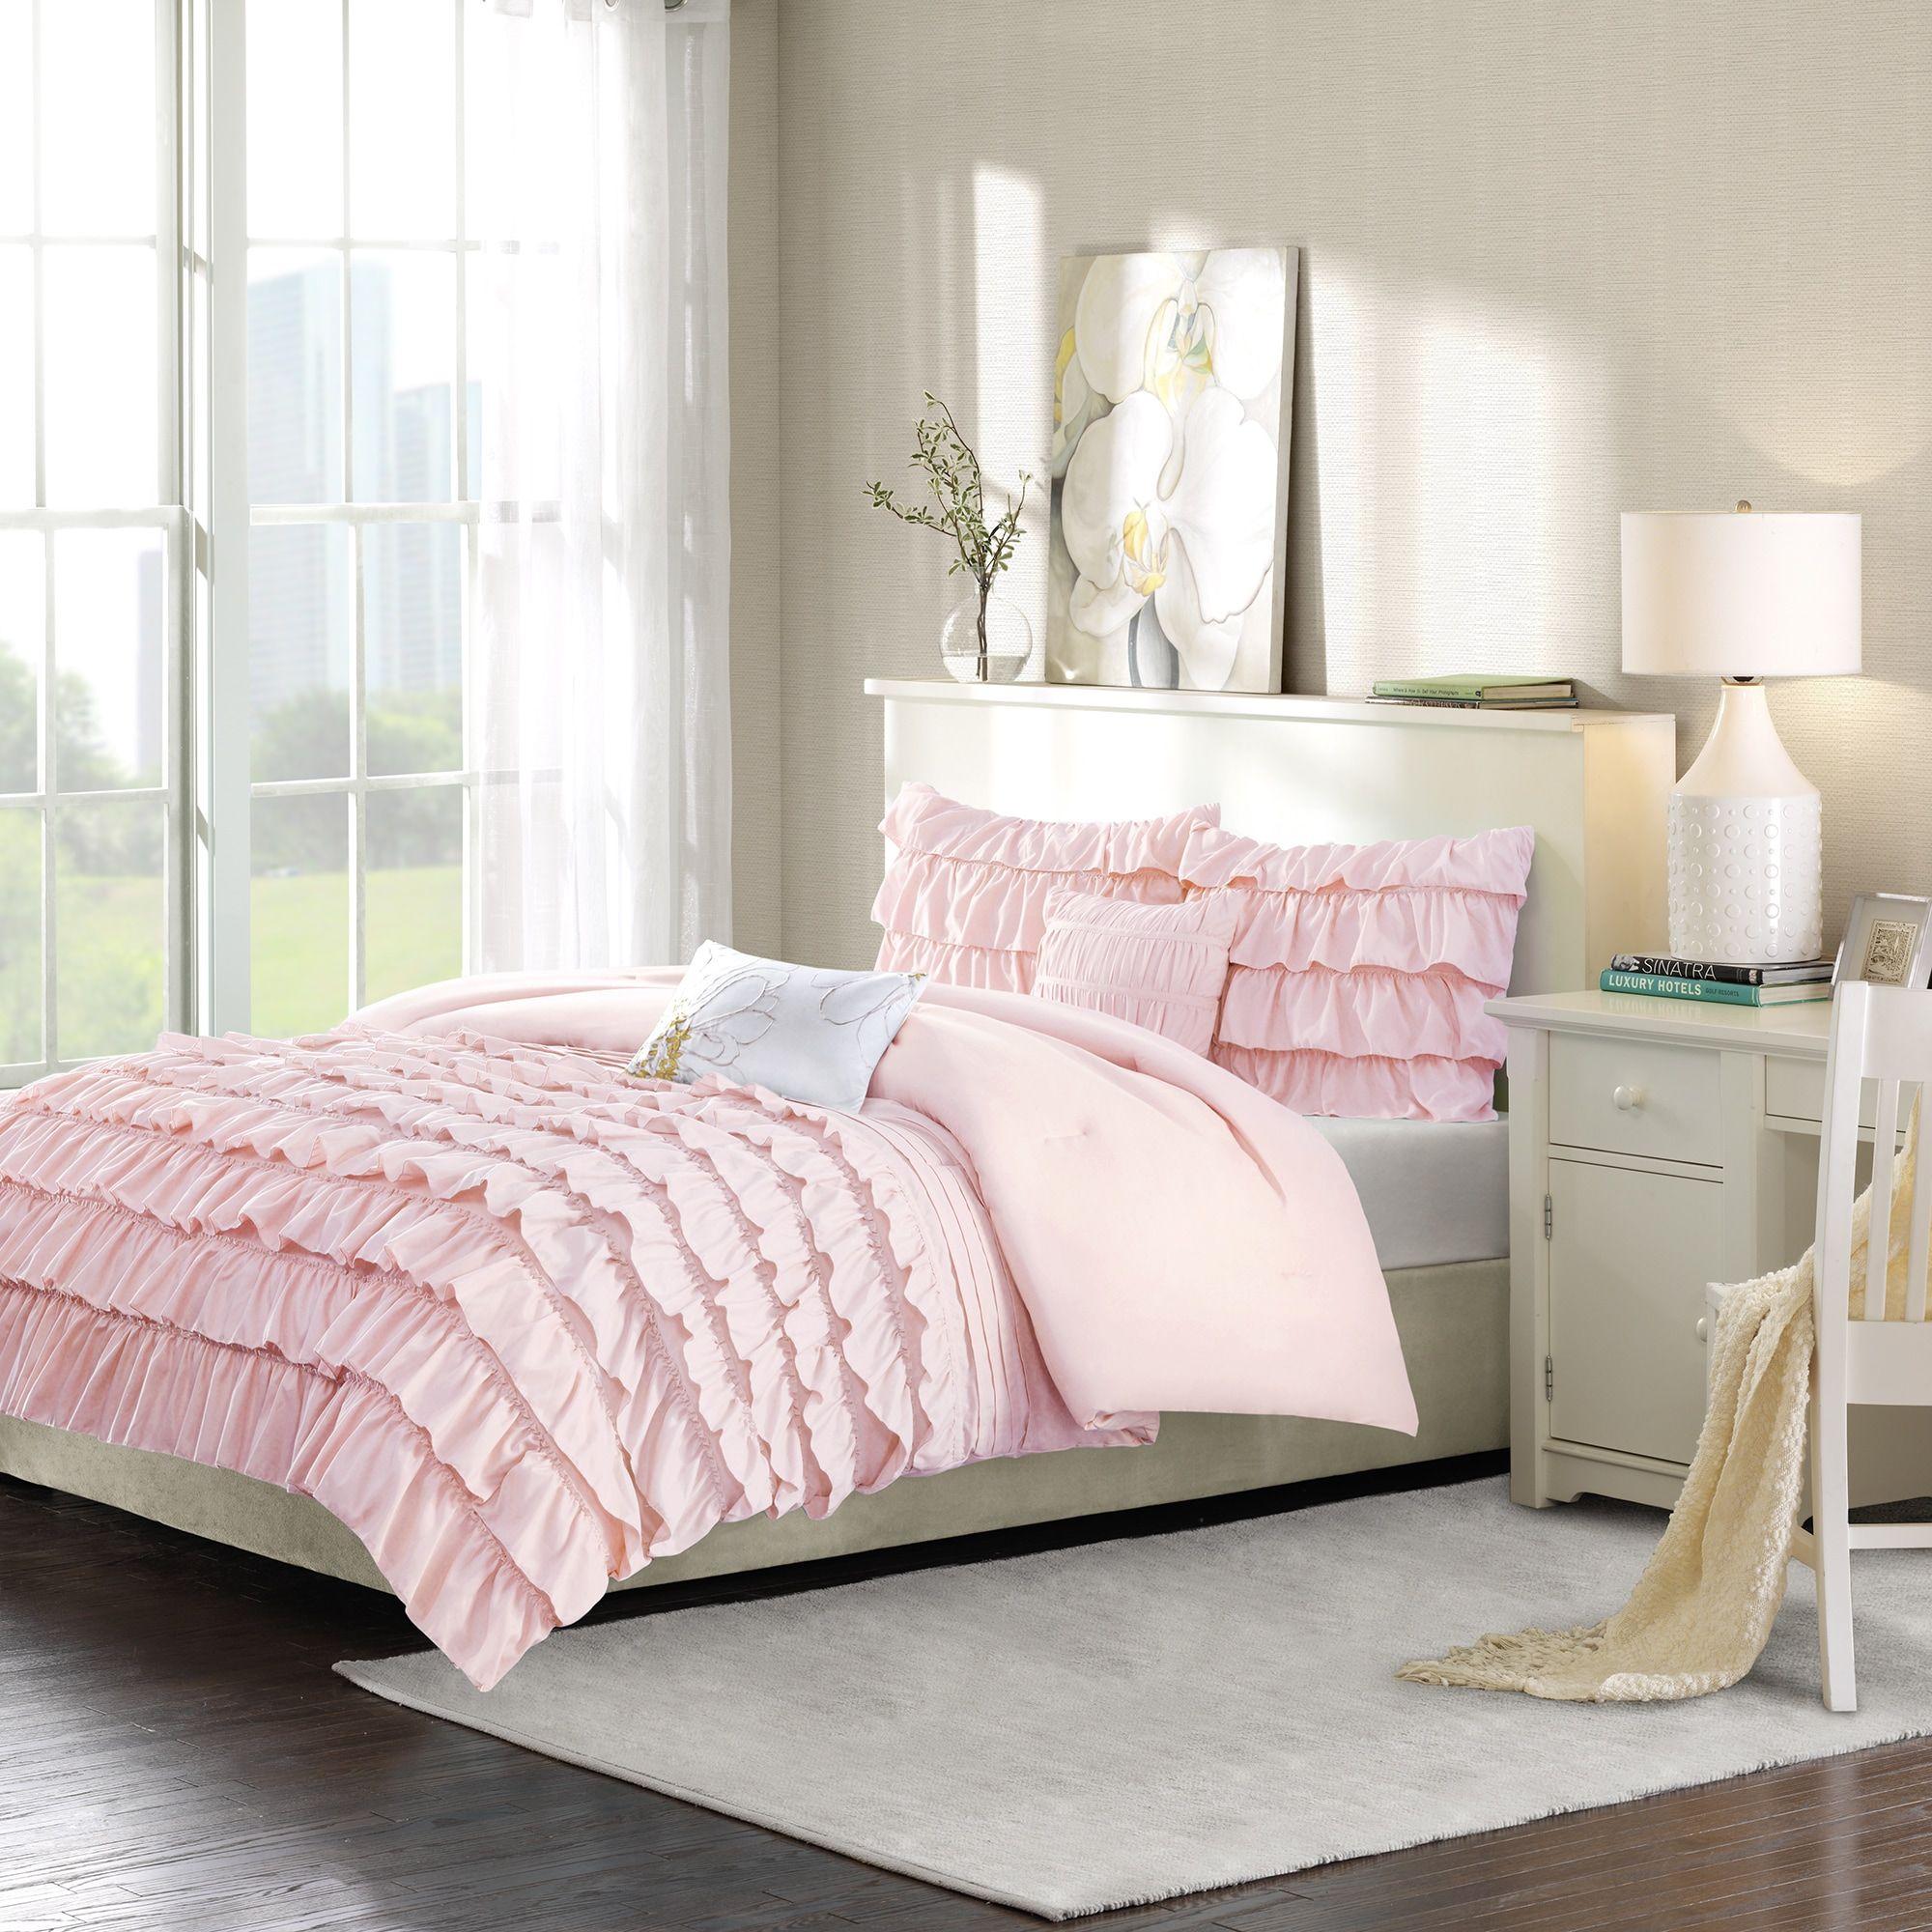 Intelligent Design Demi Blush 5 Piece Ruffle Comforter Set With